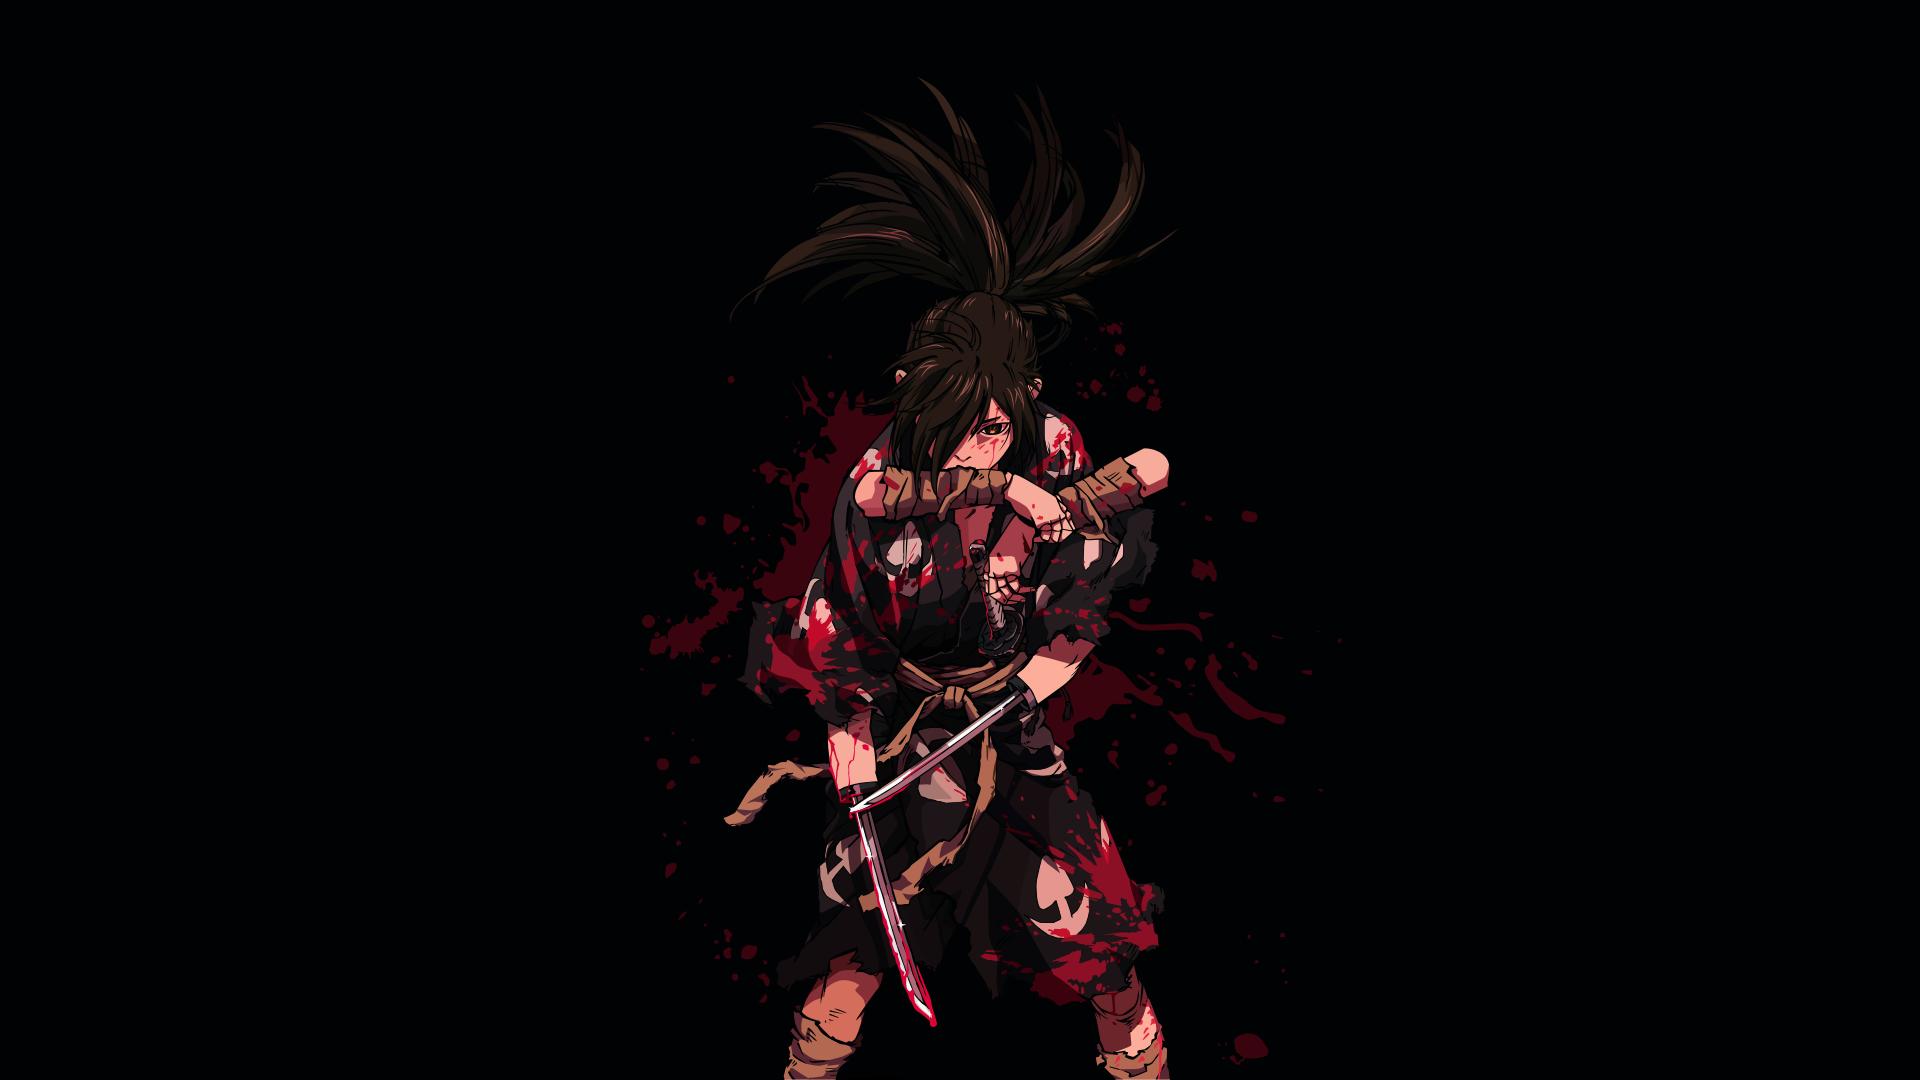 Unduh 1000 Wallpaper Abstrak Anime HD Terbaik